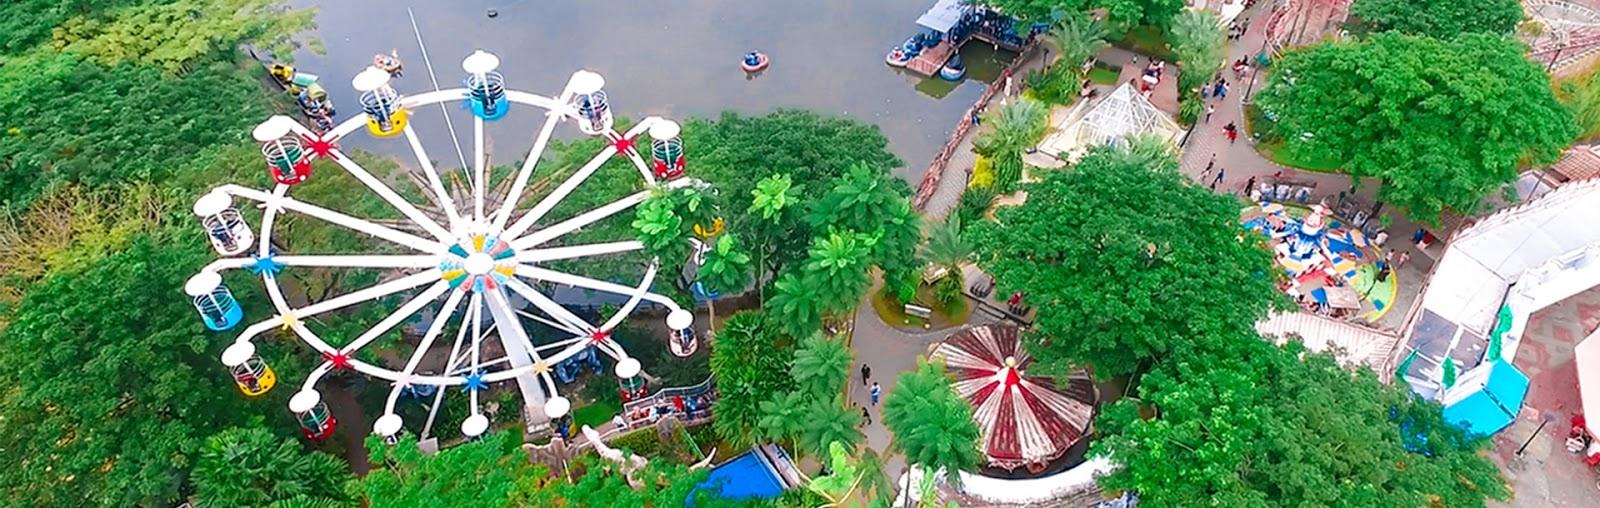 Wisata Asik Citra Raya Water World Tangerang Info Beragam Miniatur